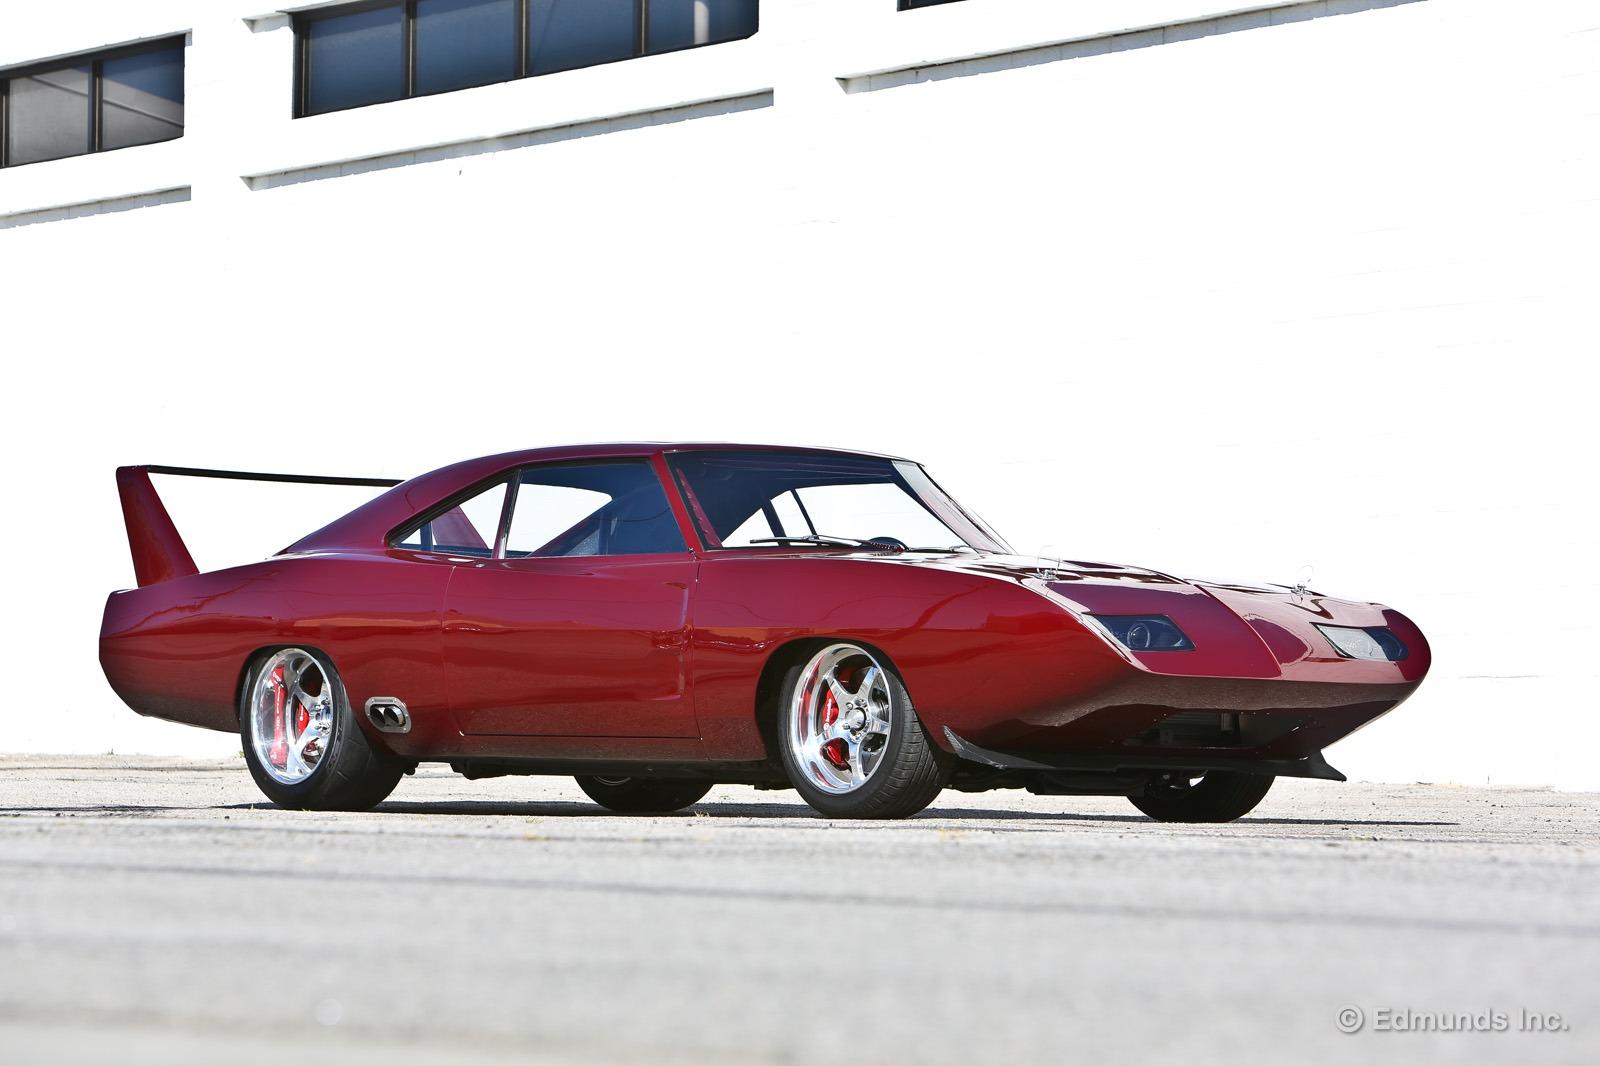 Dodge_1969 daytona_fast_furious_6__fast_furious_6_34_fe_315132_1600